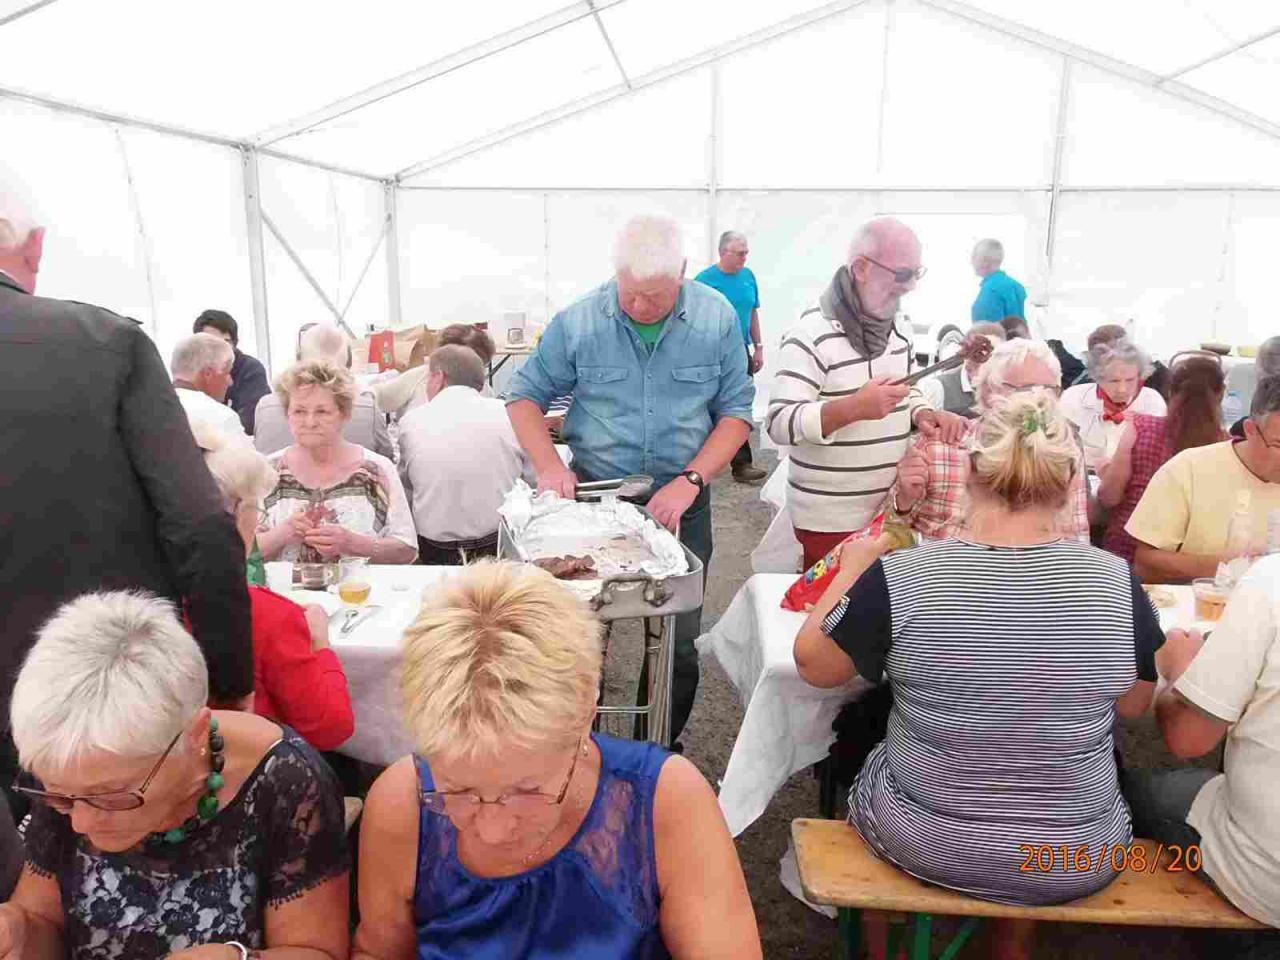 2016.08.20 Repas au CABAN (85)